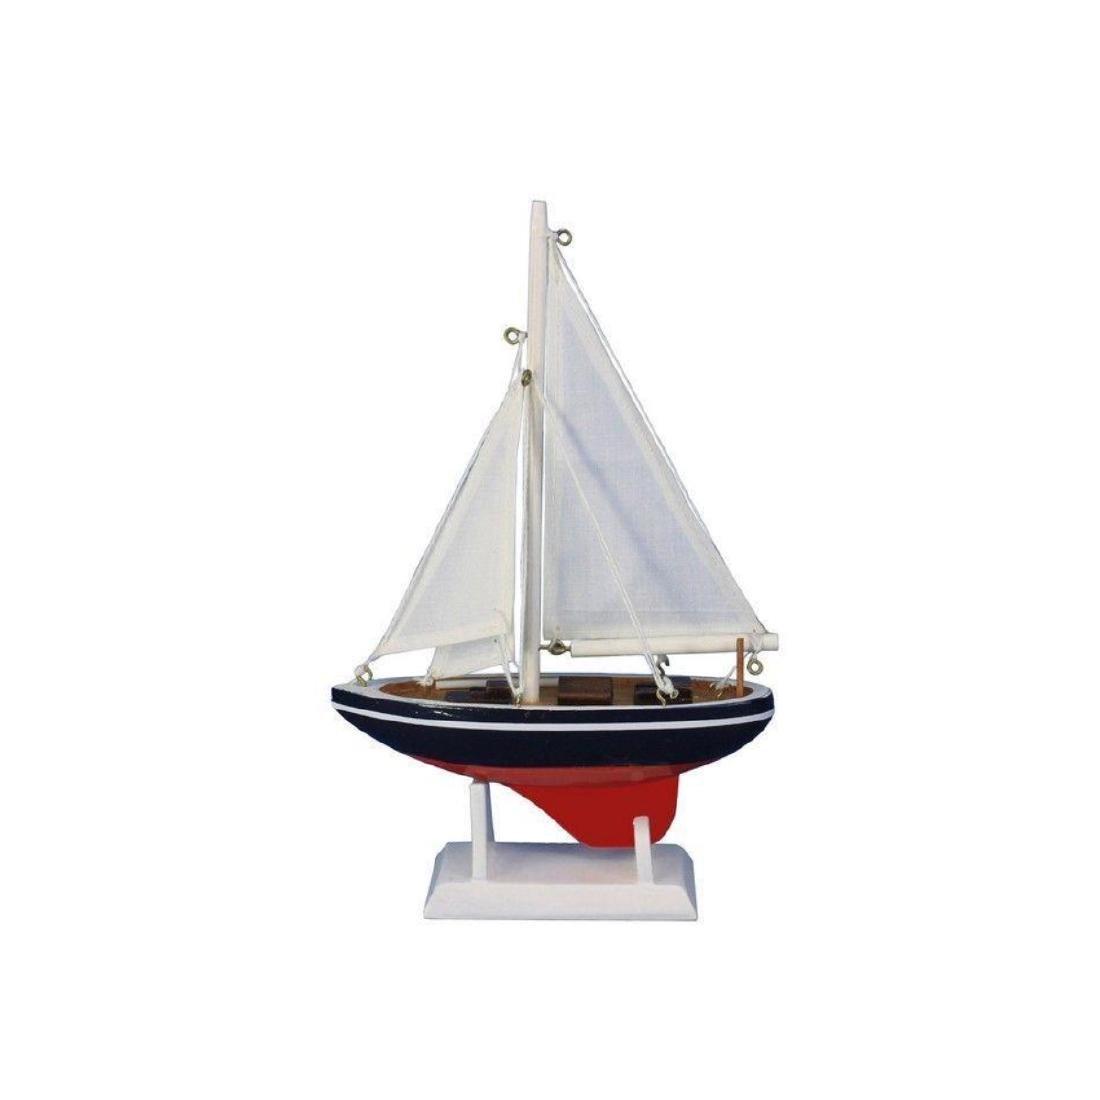 "Wooden American Sailer Model Sailboat Decoration 9"" - 2"